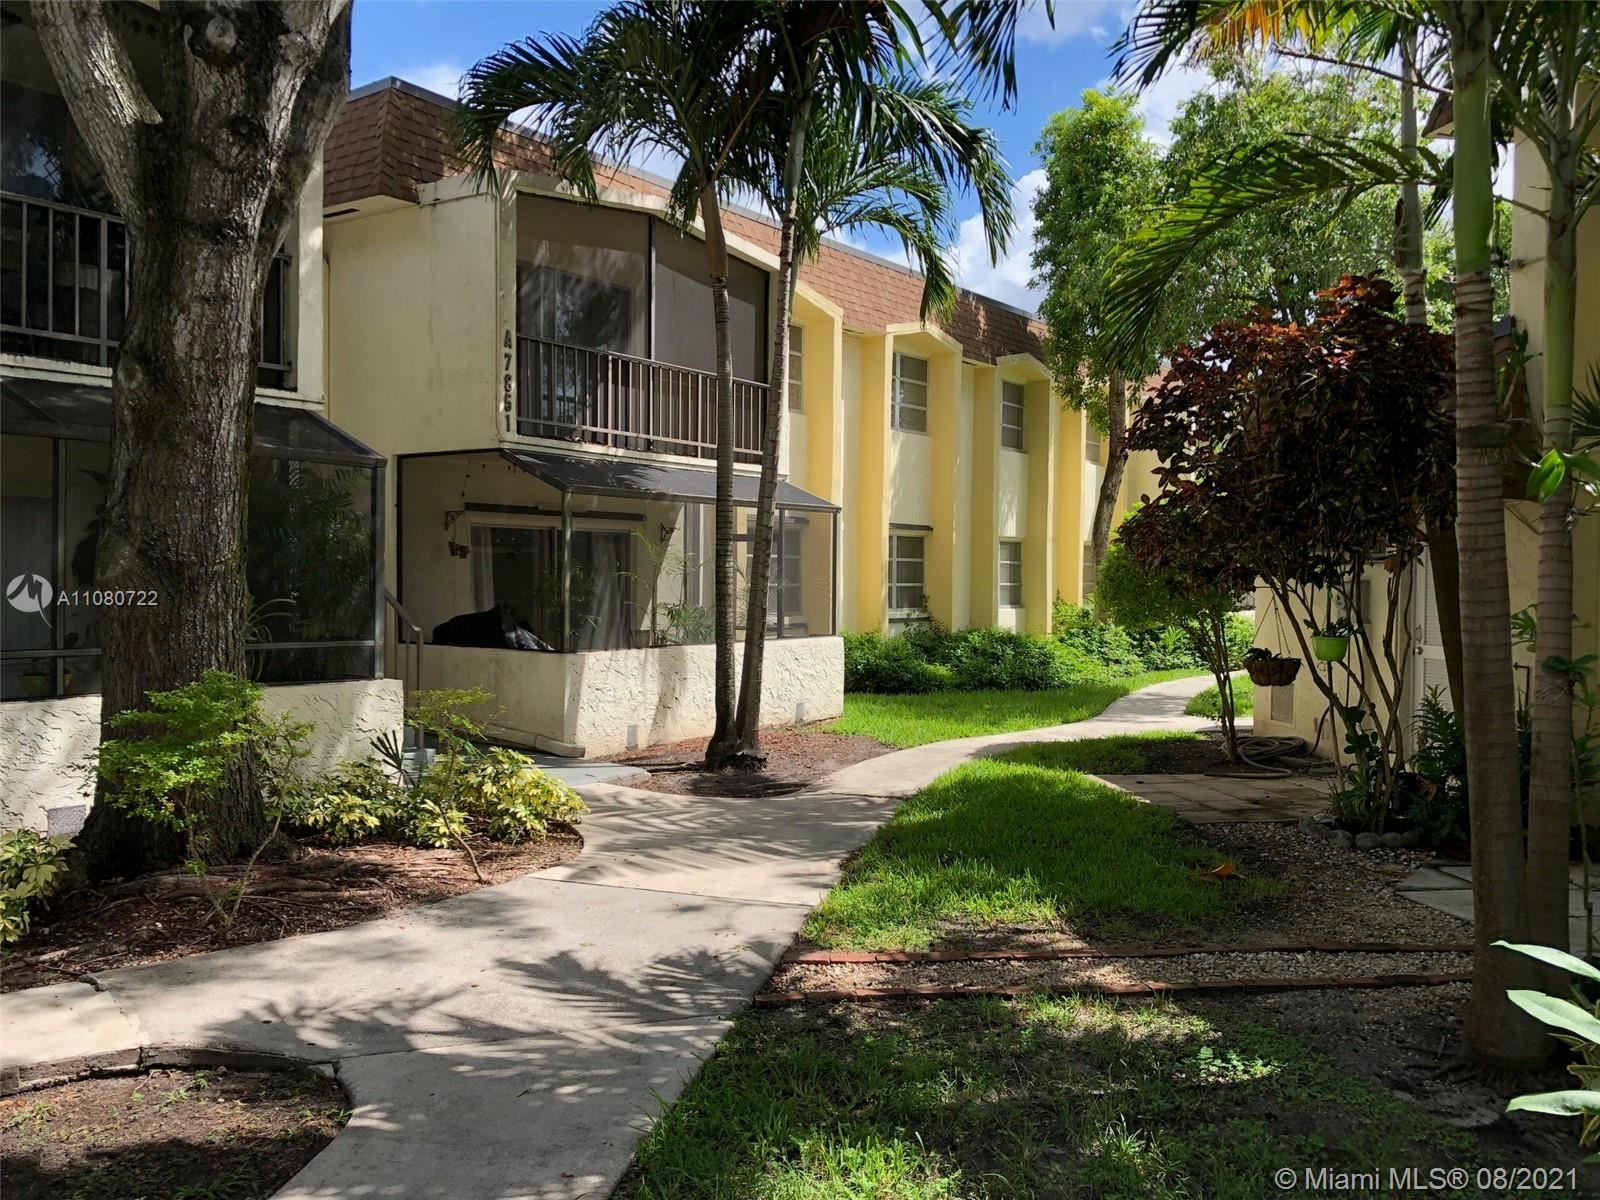 7851 Miller Dr #A217, Miami, FL 33155 - #: A11080722